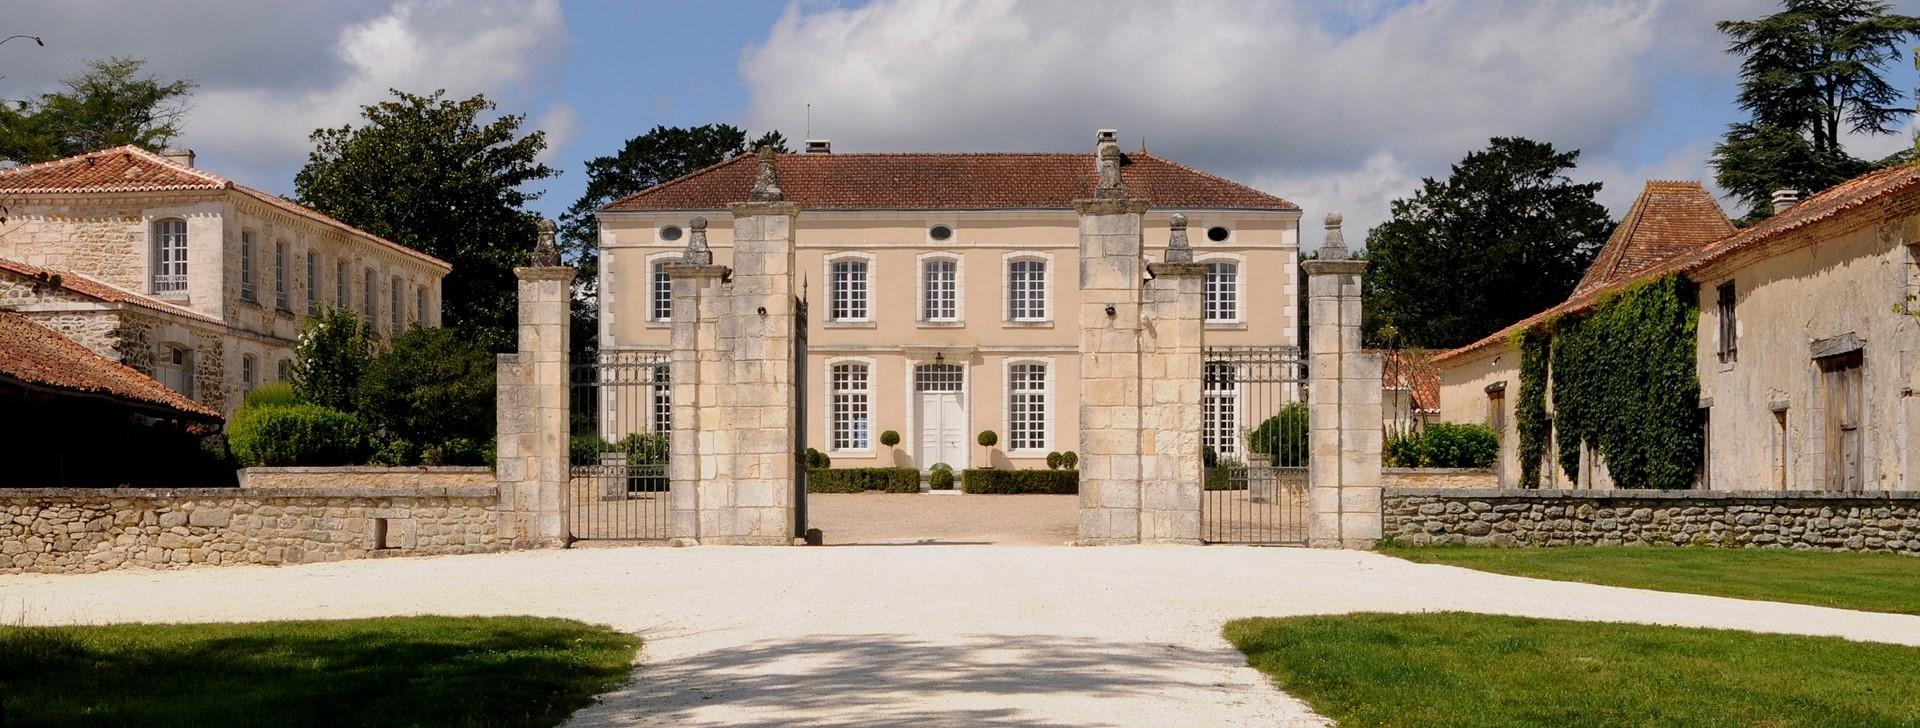 8-bedroom-luxury-villa-dordogne-france